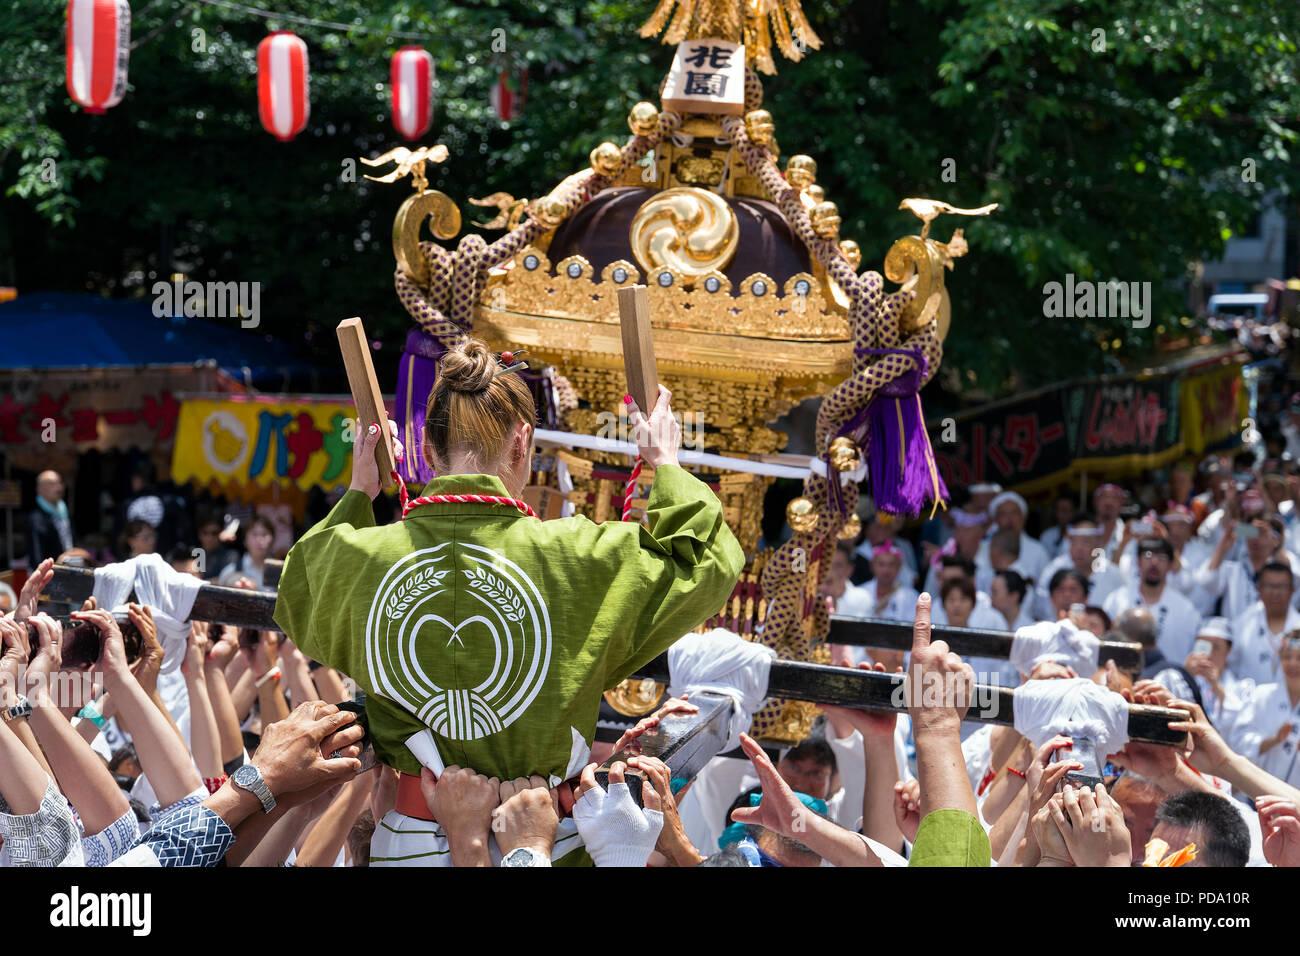 Japan, Honshu island, Kanto, Tokyo, Hanazono Shrine Grand Festival. - Stock Image